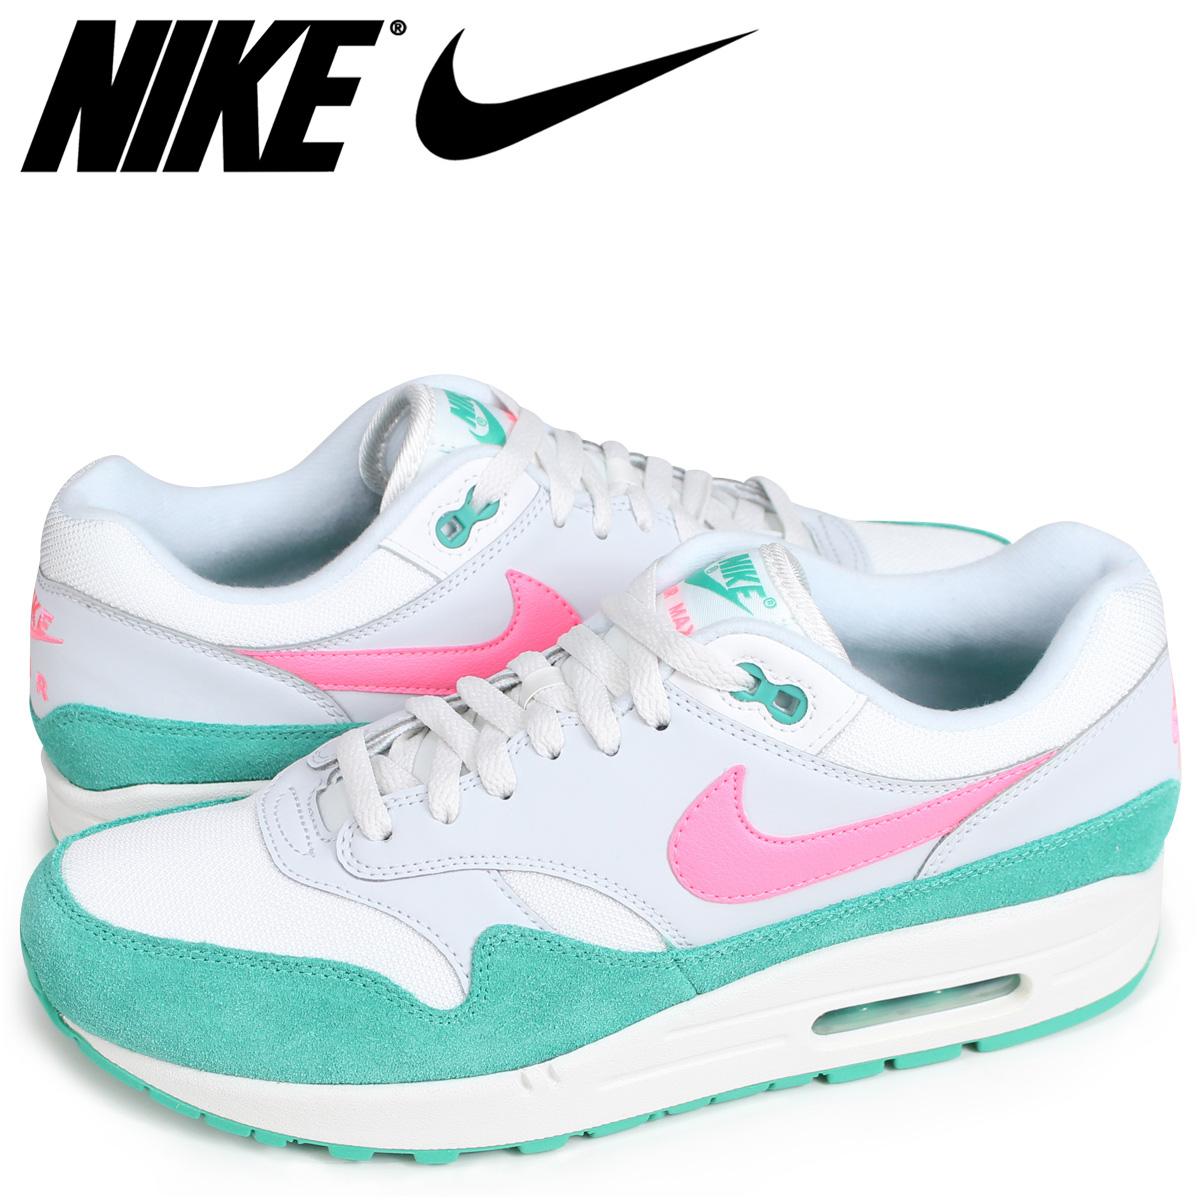 Men ShopNike Online Sneakers Sneak Air Summer 1 Max rtdBhQxCs